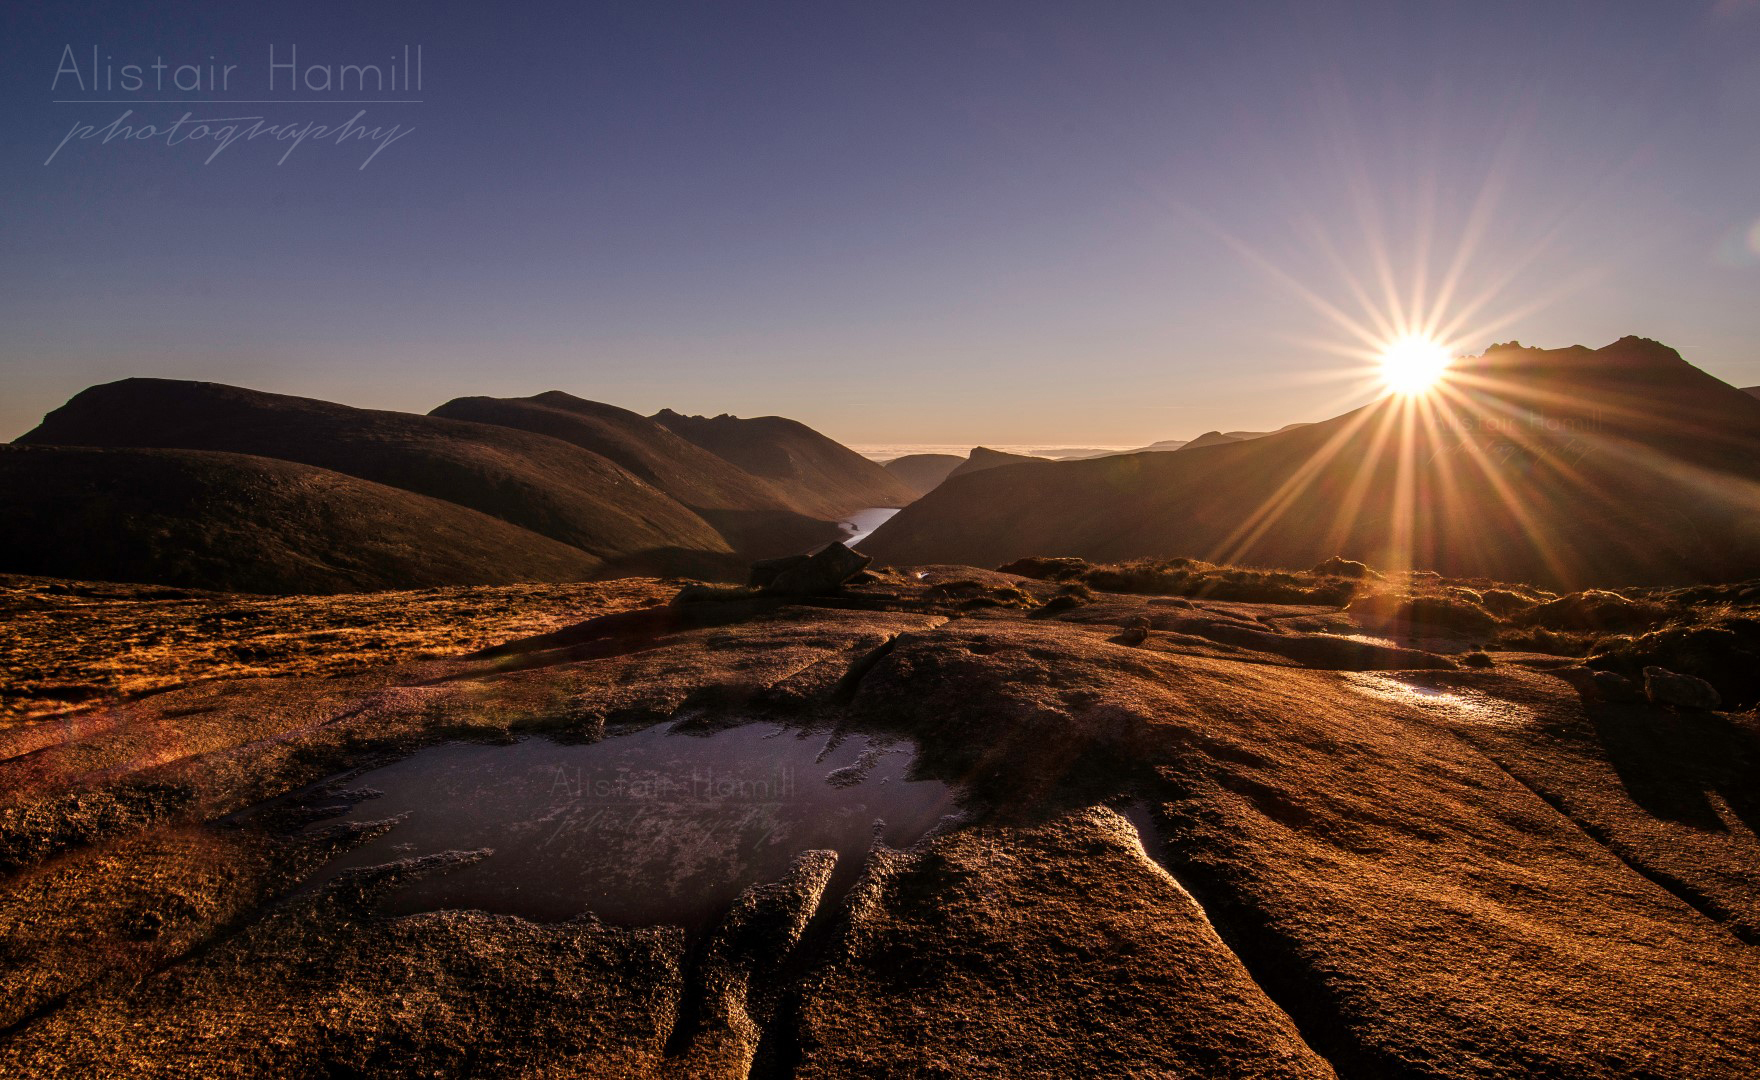 Slievenaglogh sunset day (108 of 335 edited) (Large) wm.jpg